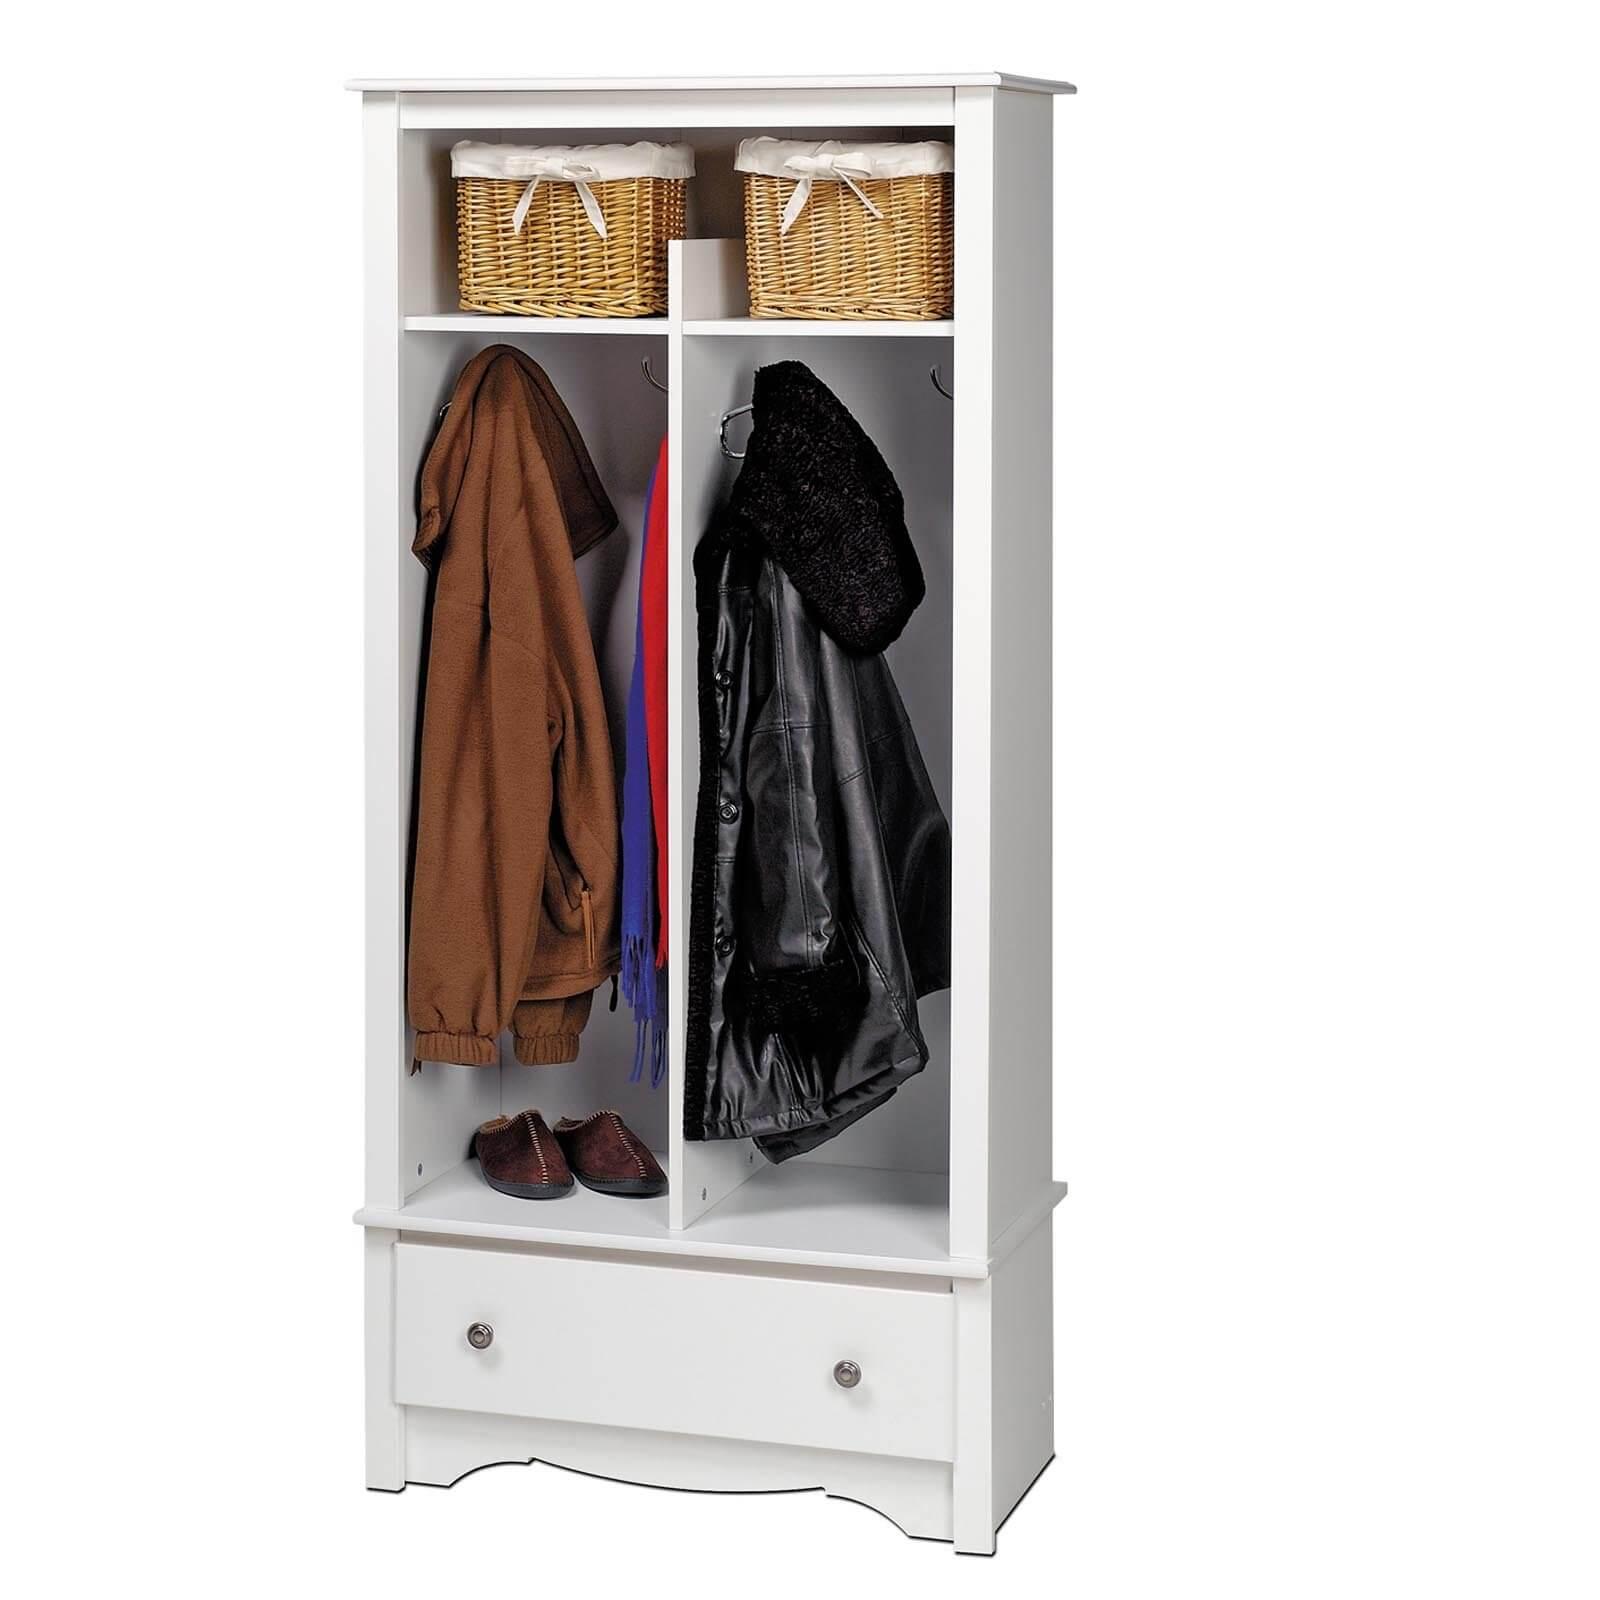 Mudroom Coat Storage : Top mudroom lockers to tidy up storage